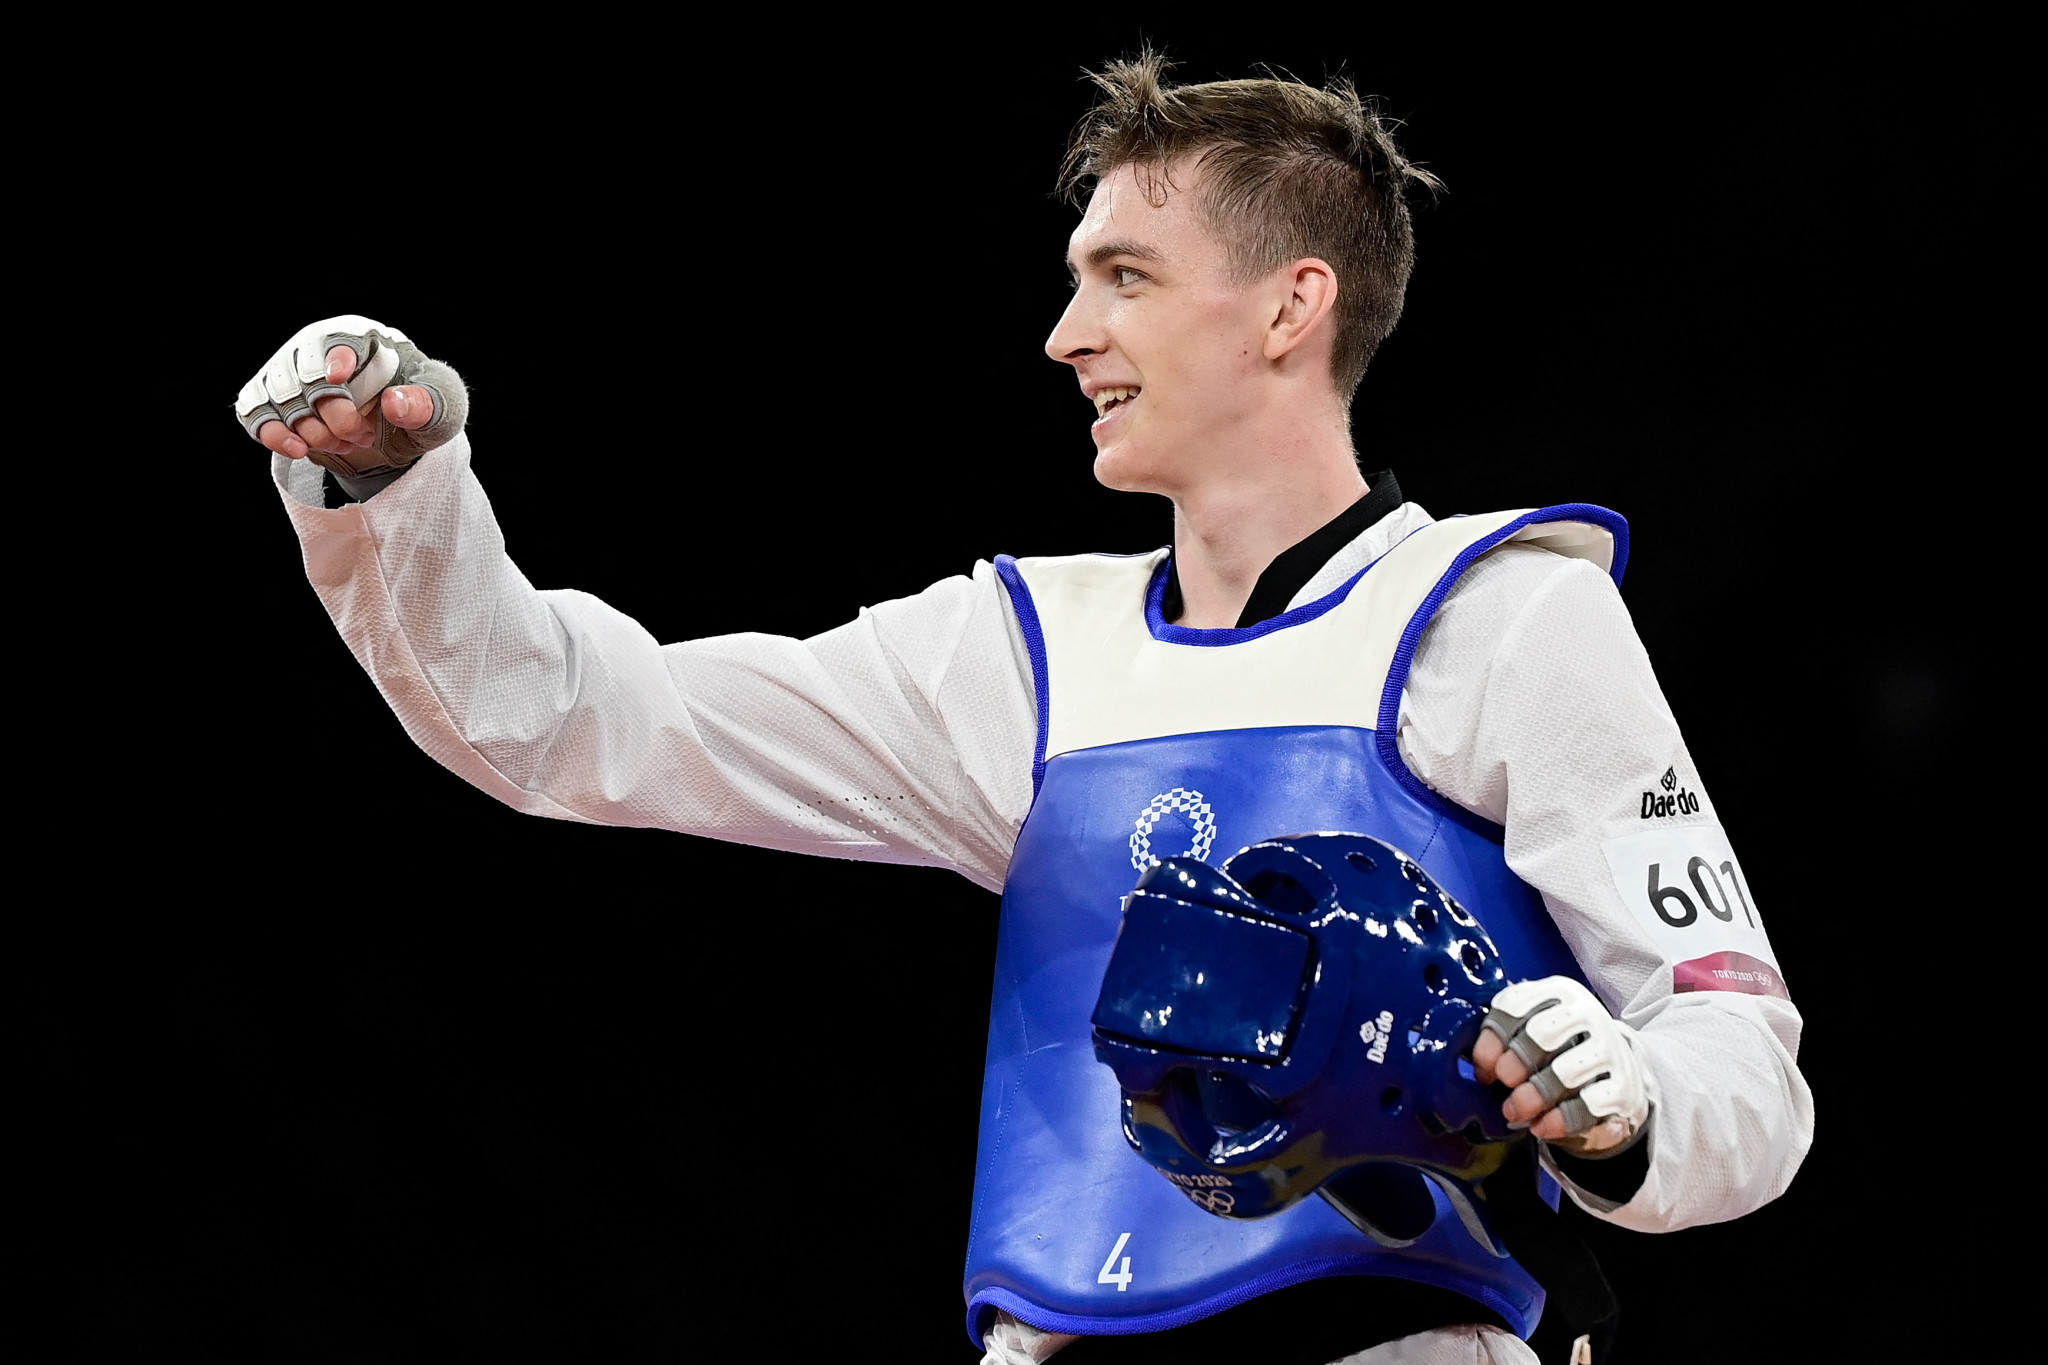 Maksim Khramtsov beat Jordan's Saleh El-Sharabaty to win Olympic gold at Tokyo 2020 ©Getty Images